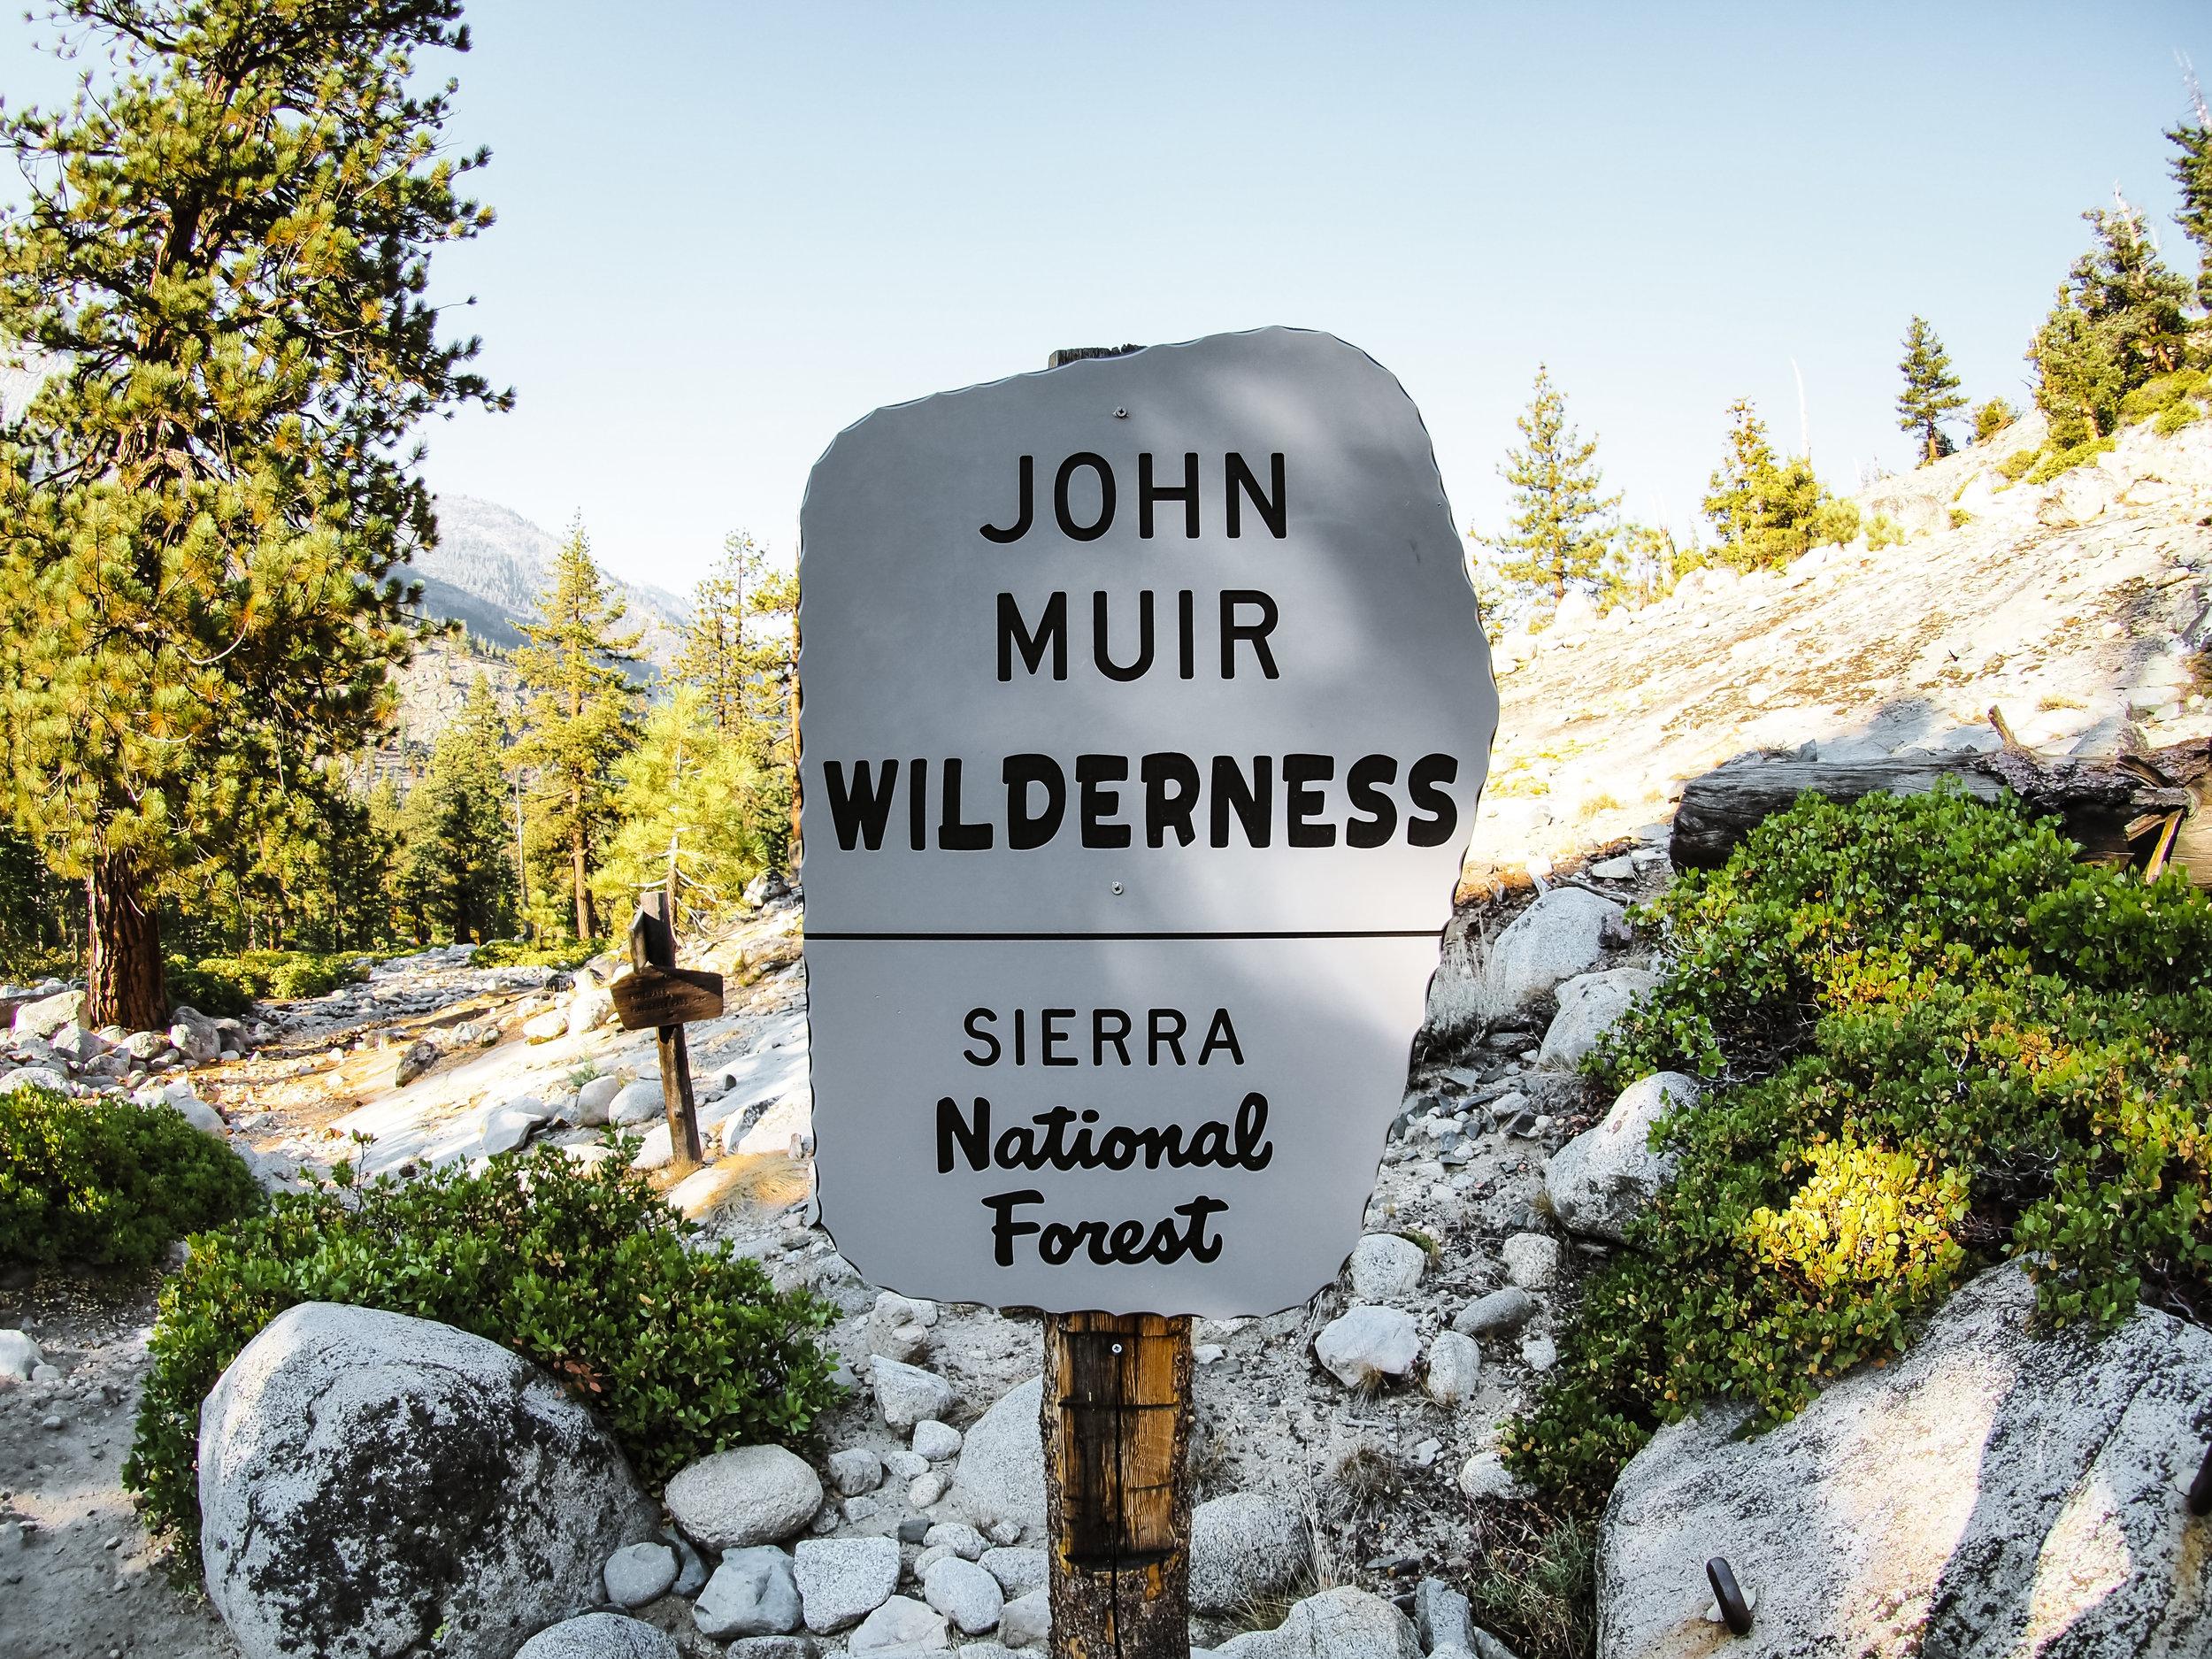 Leaving John Muir Wilderness, entering King's Canyon National Park